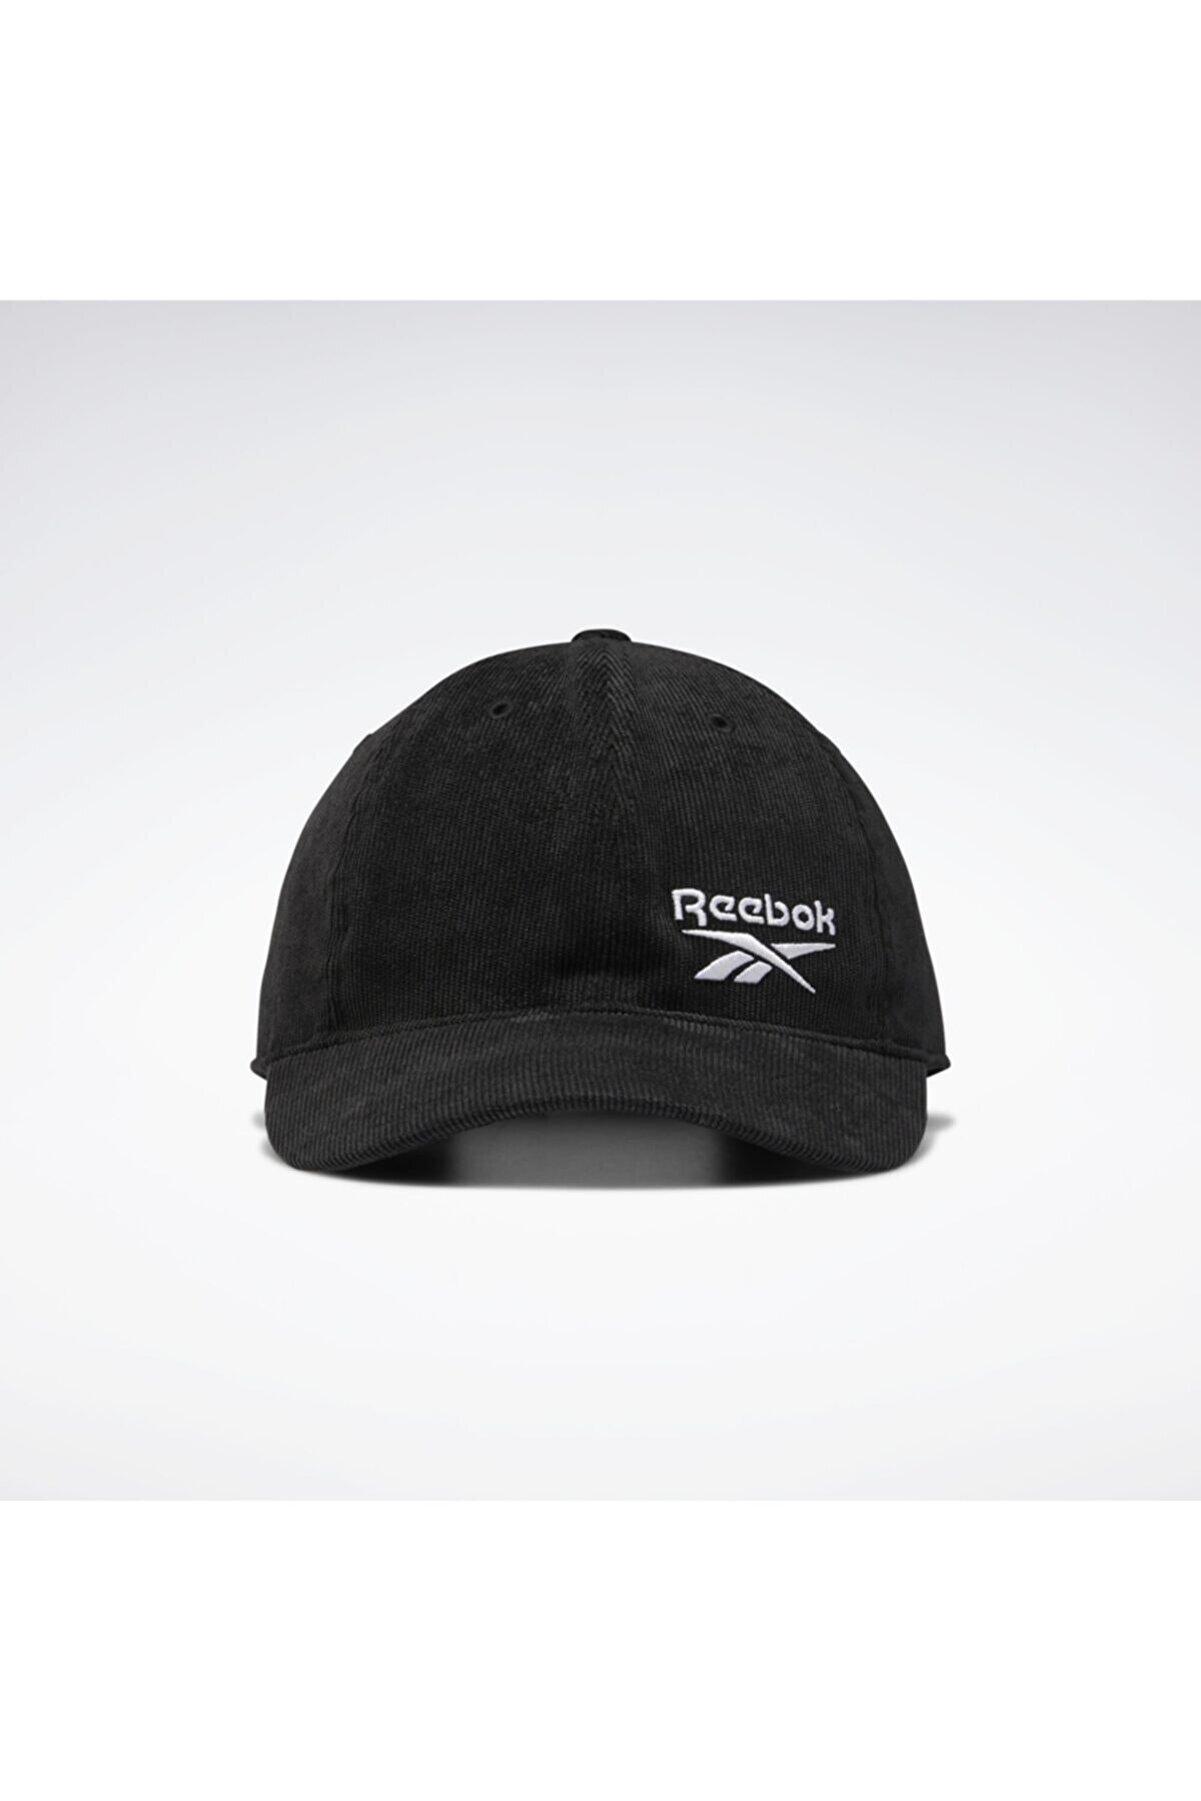 Reebok Classics Corduroy Siyah Şapka (gc8593)